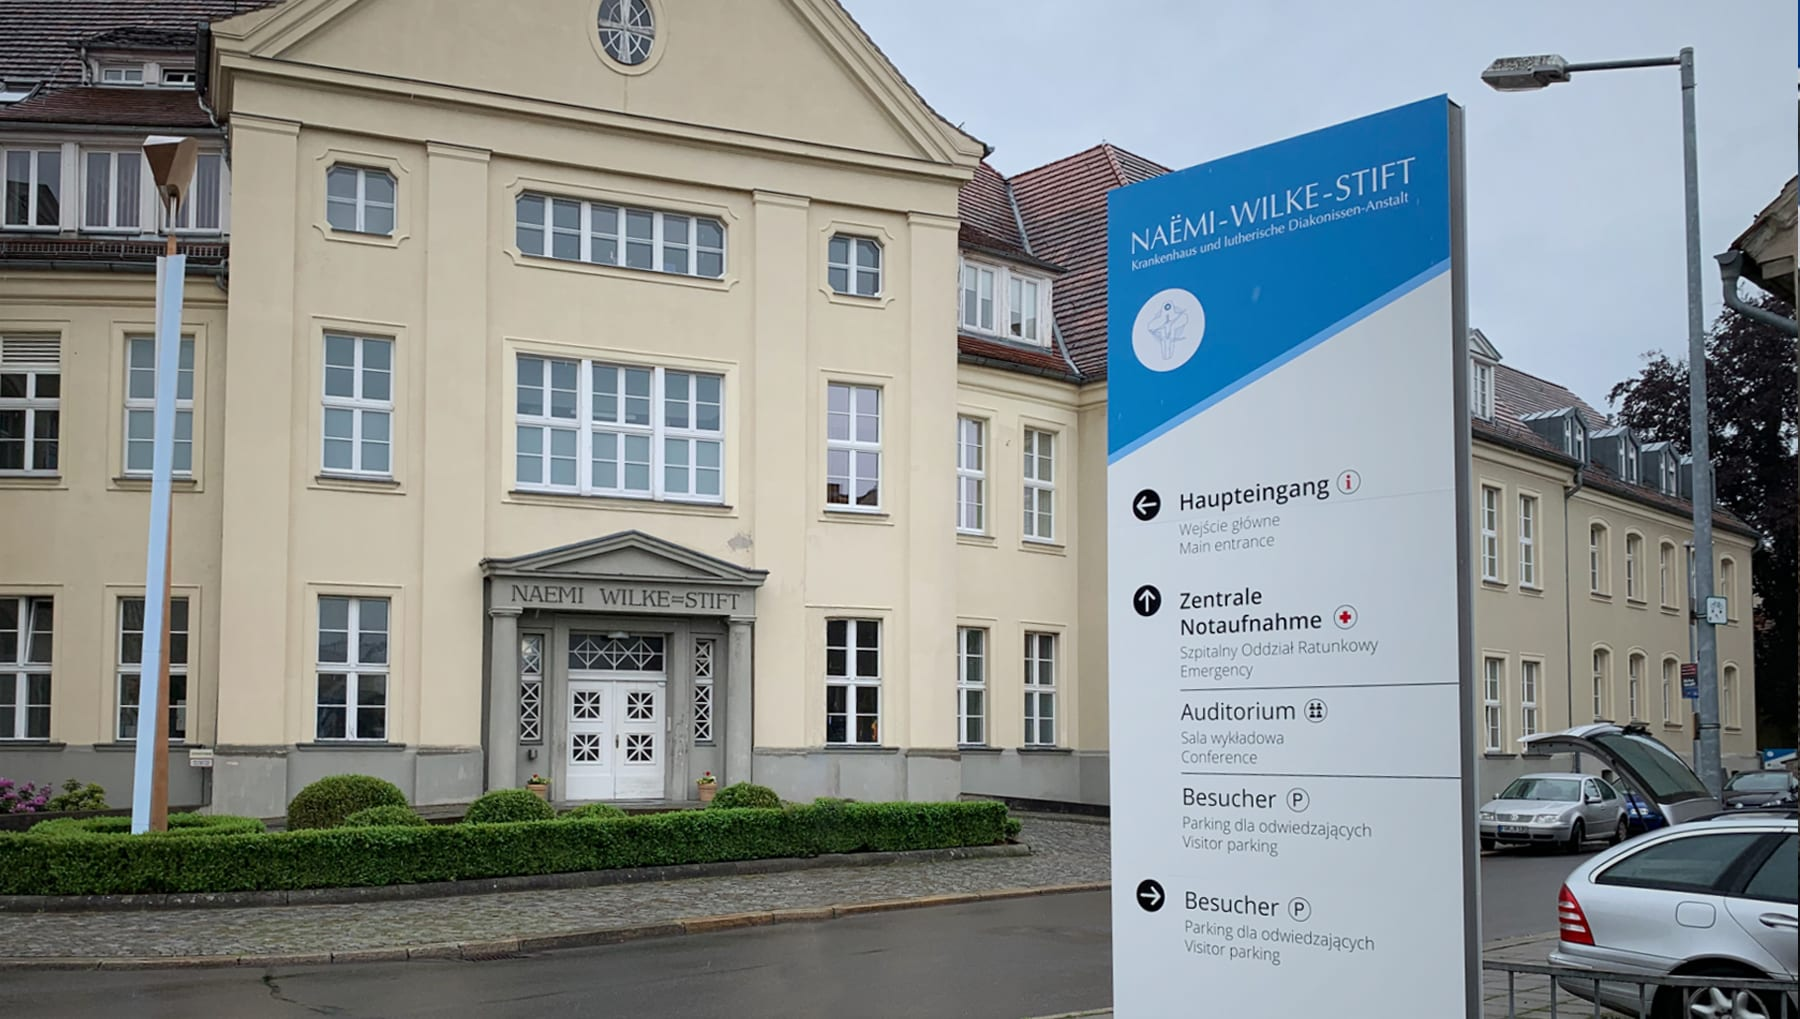 Naemi-Wilke-Stift – Es geht voran!